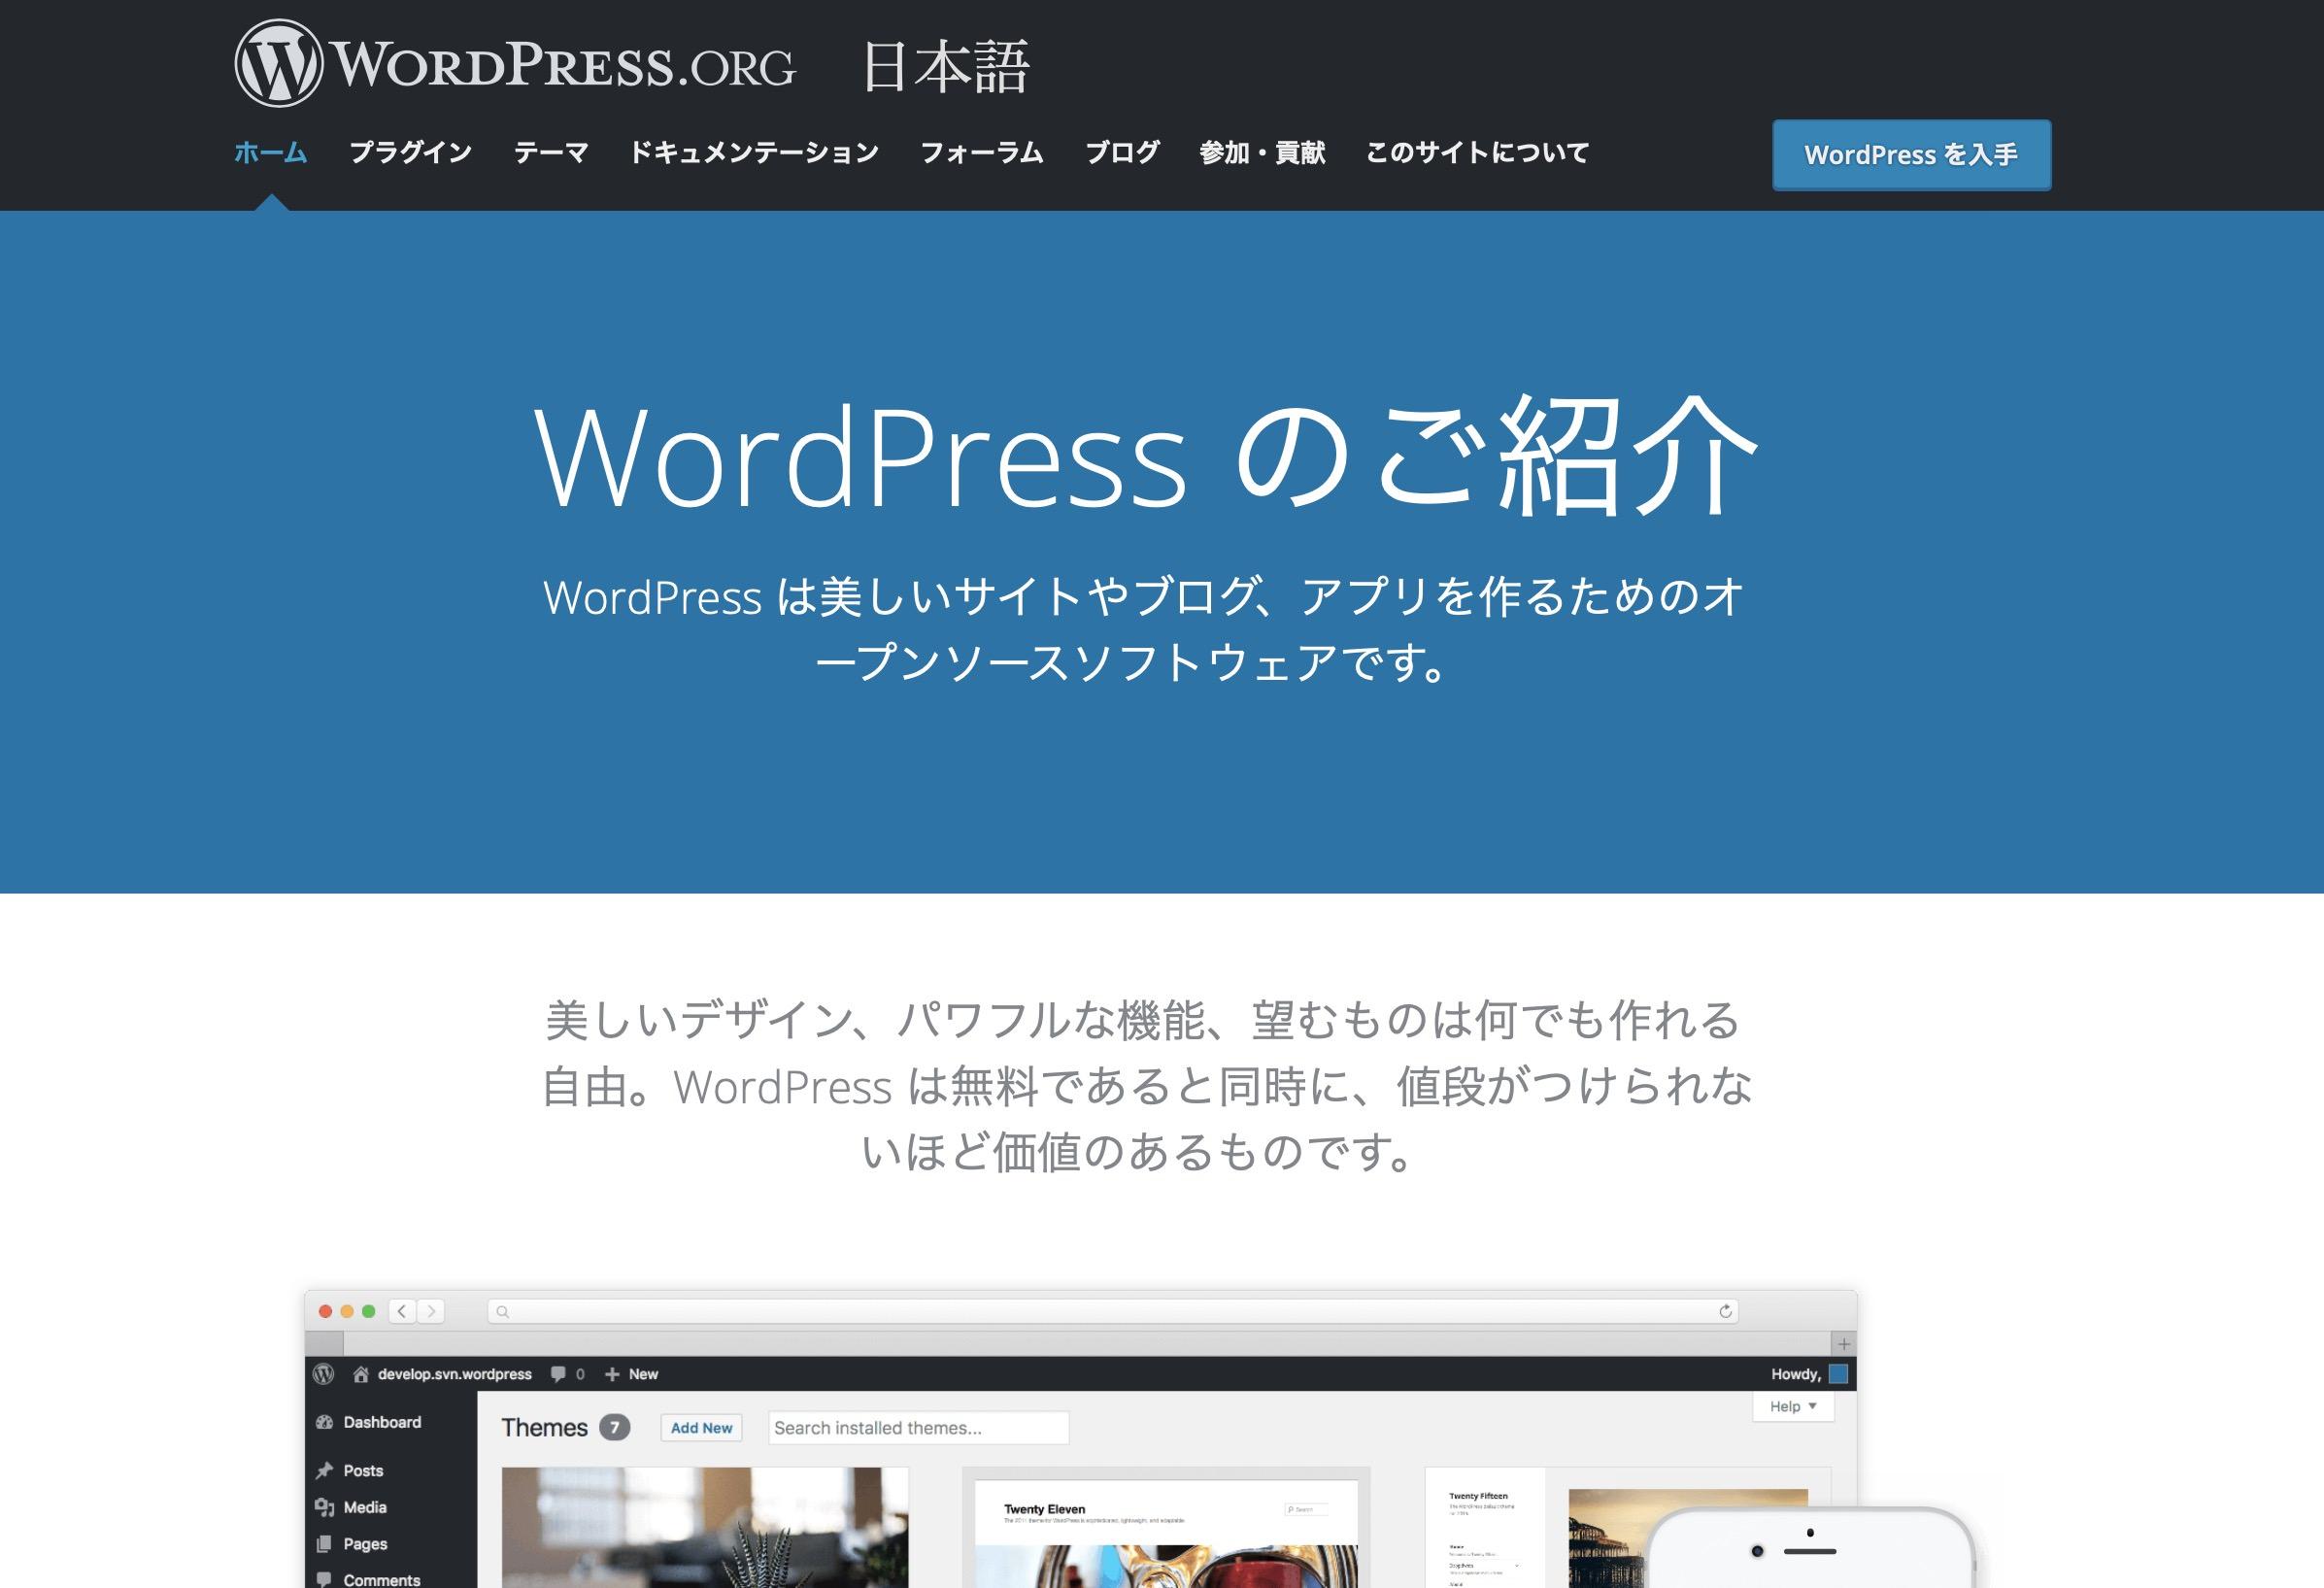 WordPress サイトキャプチャ